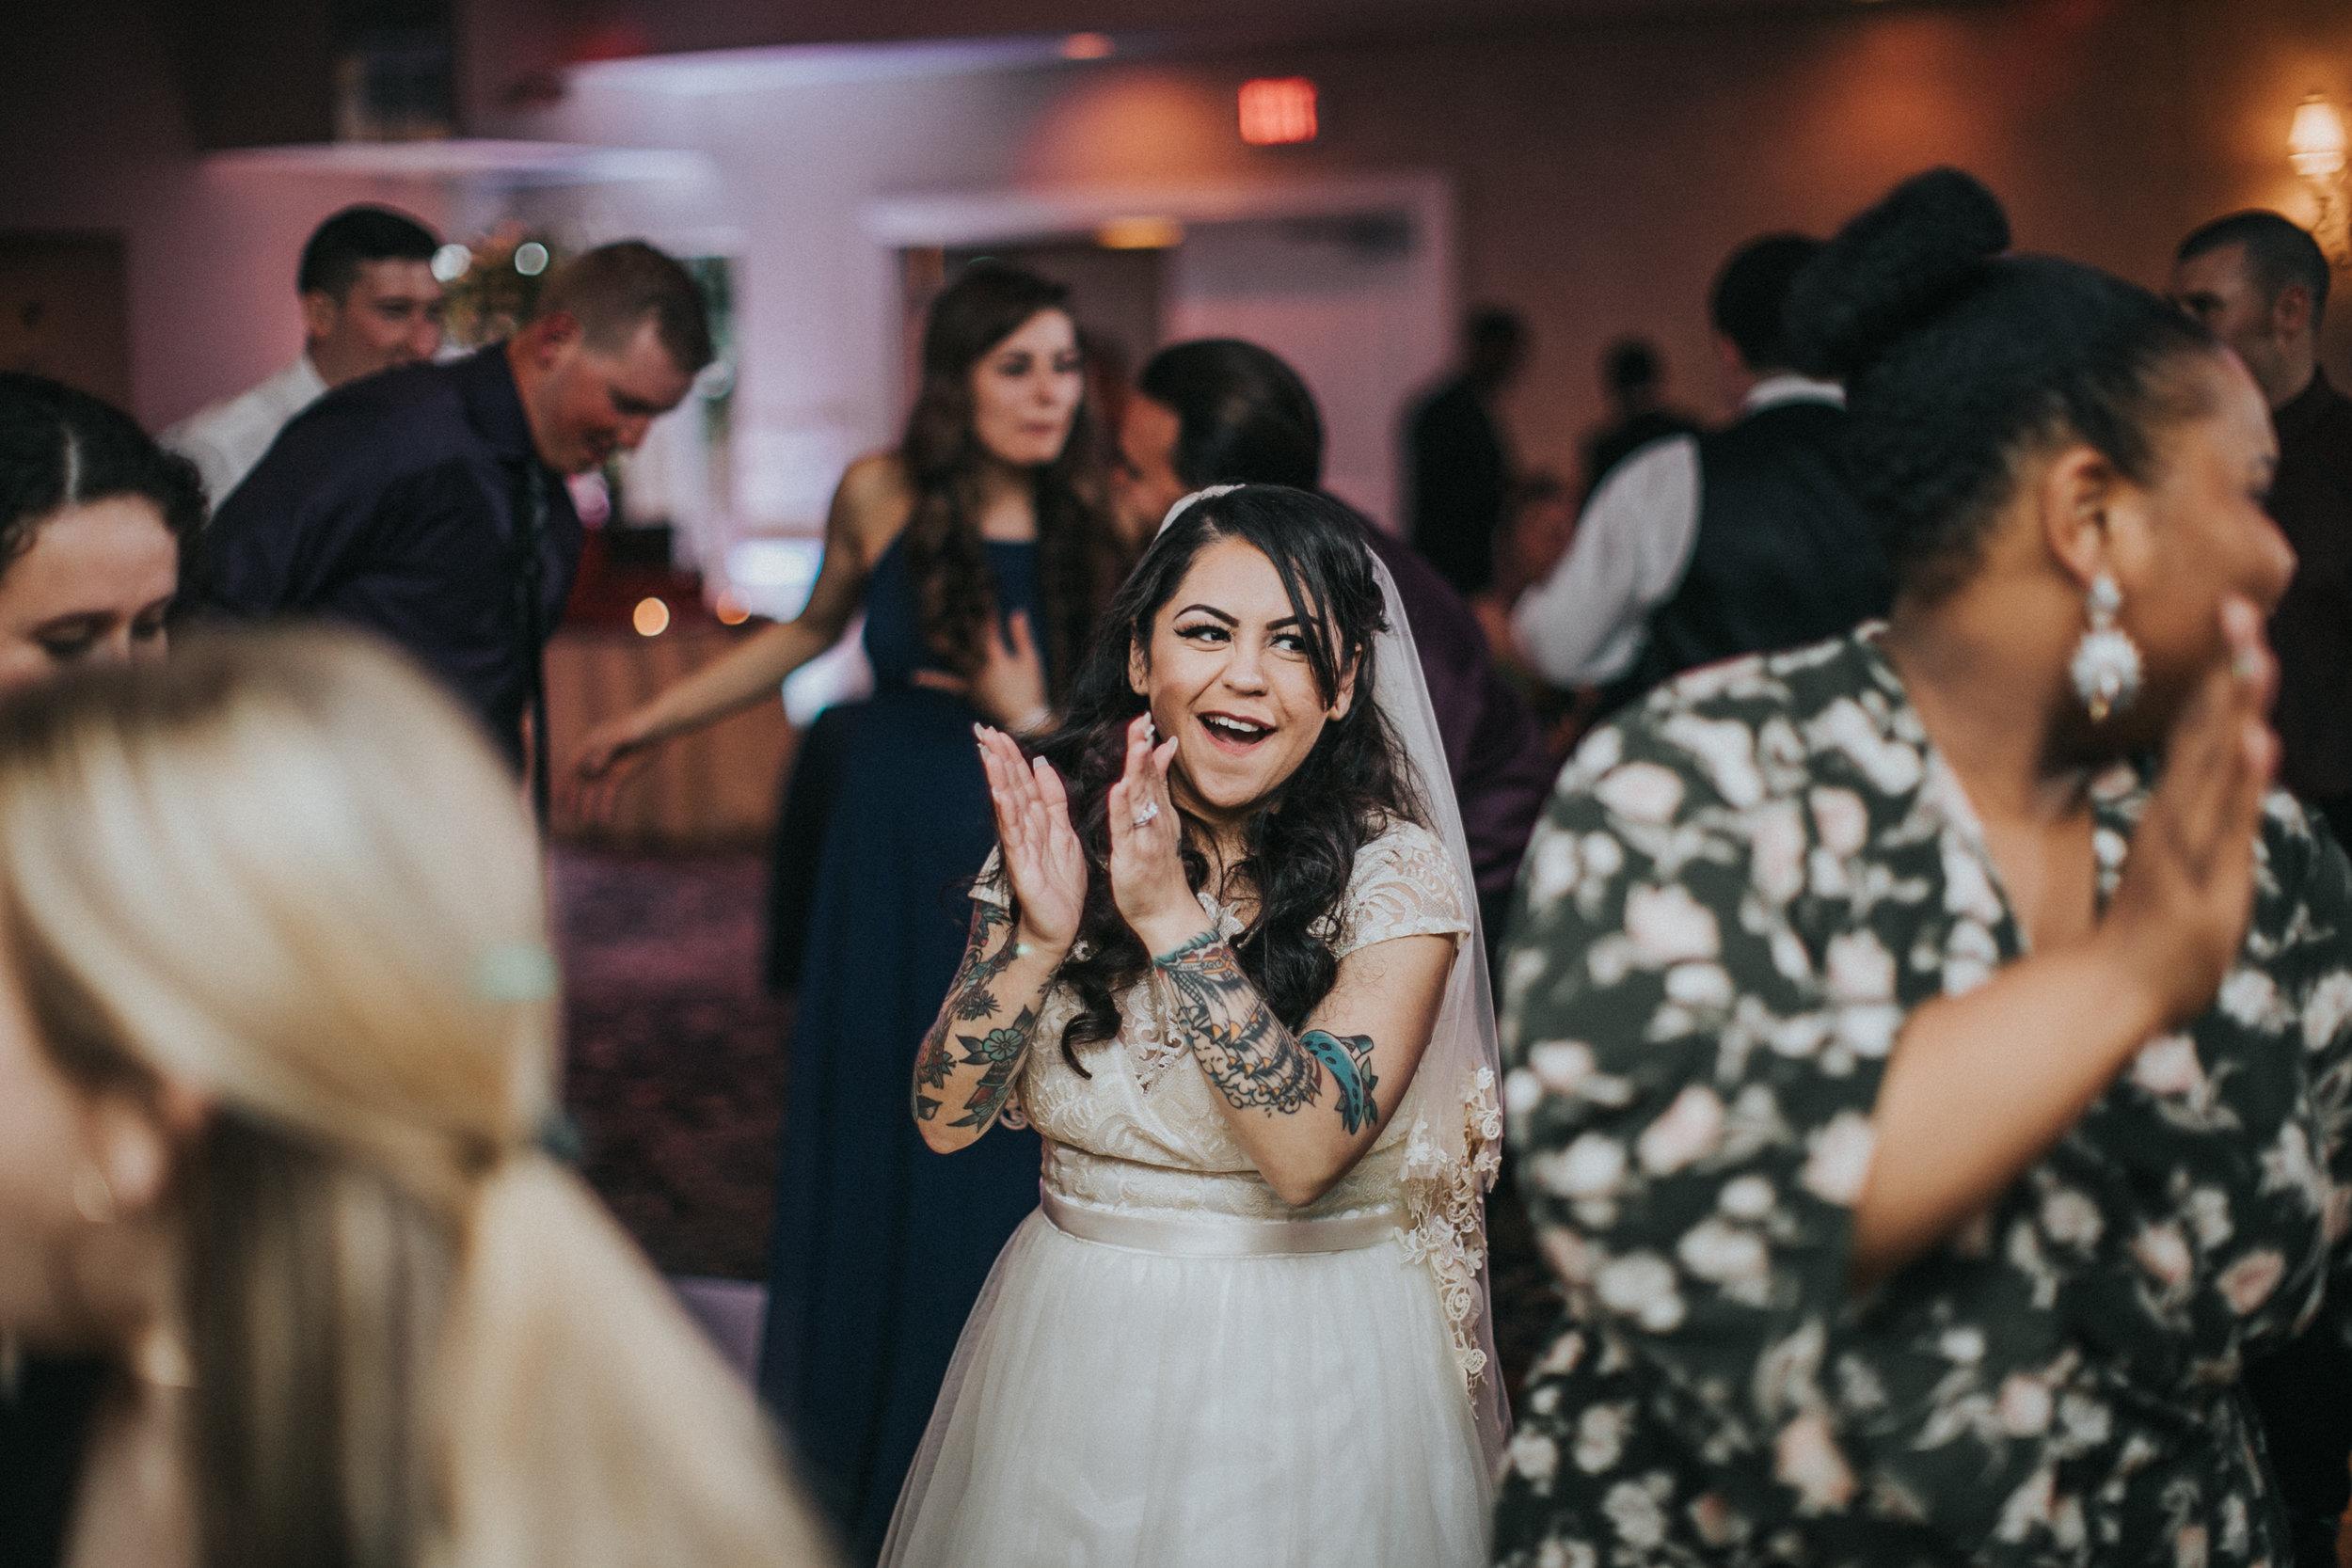 New-Jersey-Wedding-Photographer-ReceptionCenter-Valeria&Mike-Reception (105 of 265).jpg